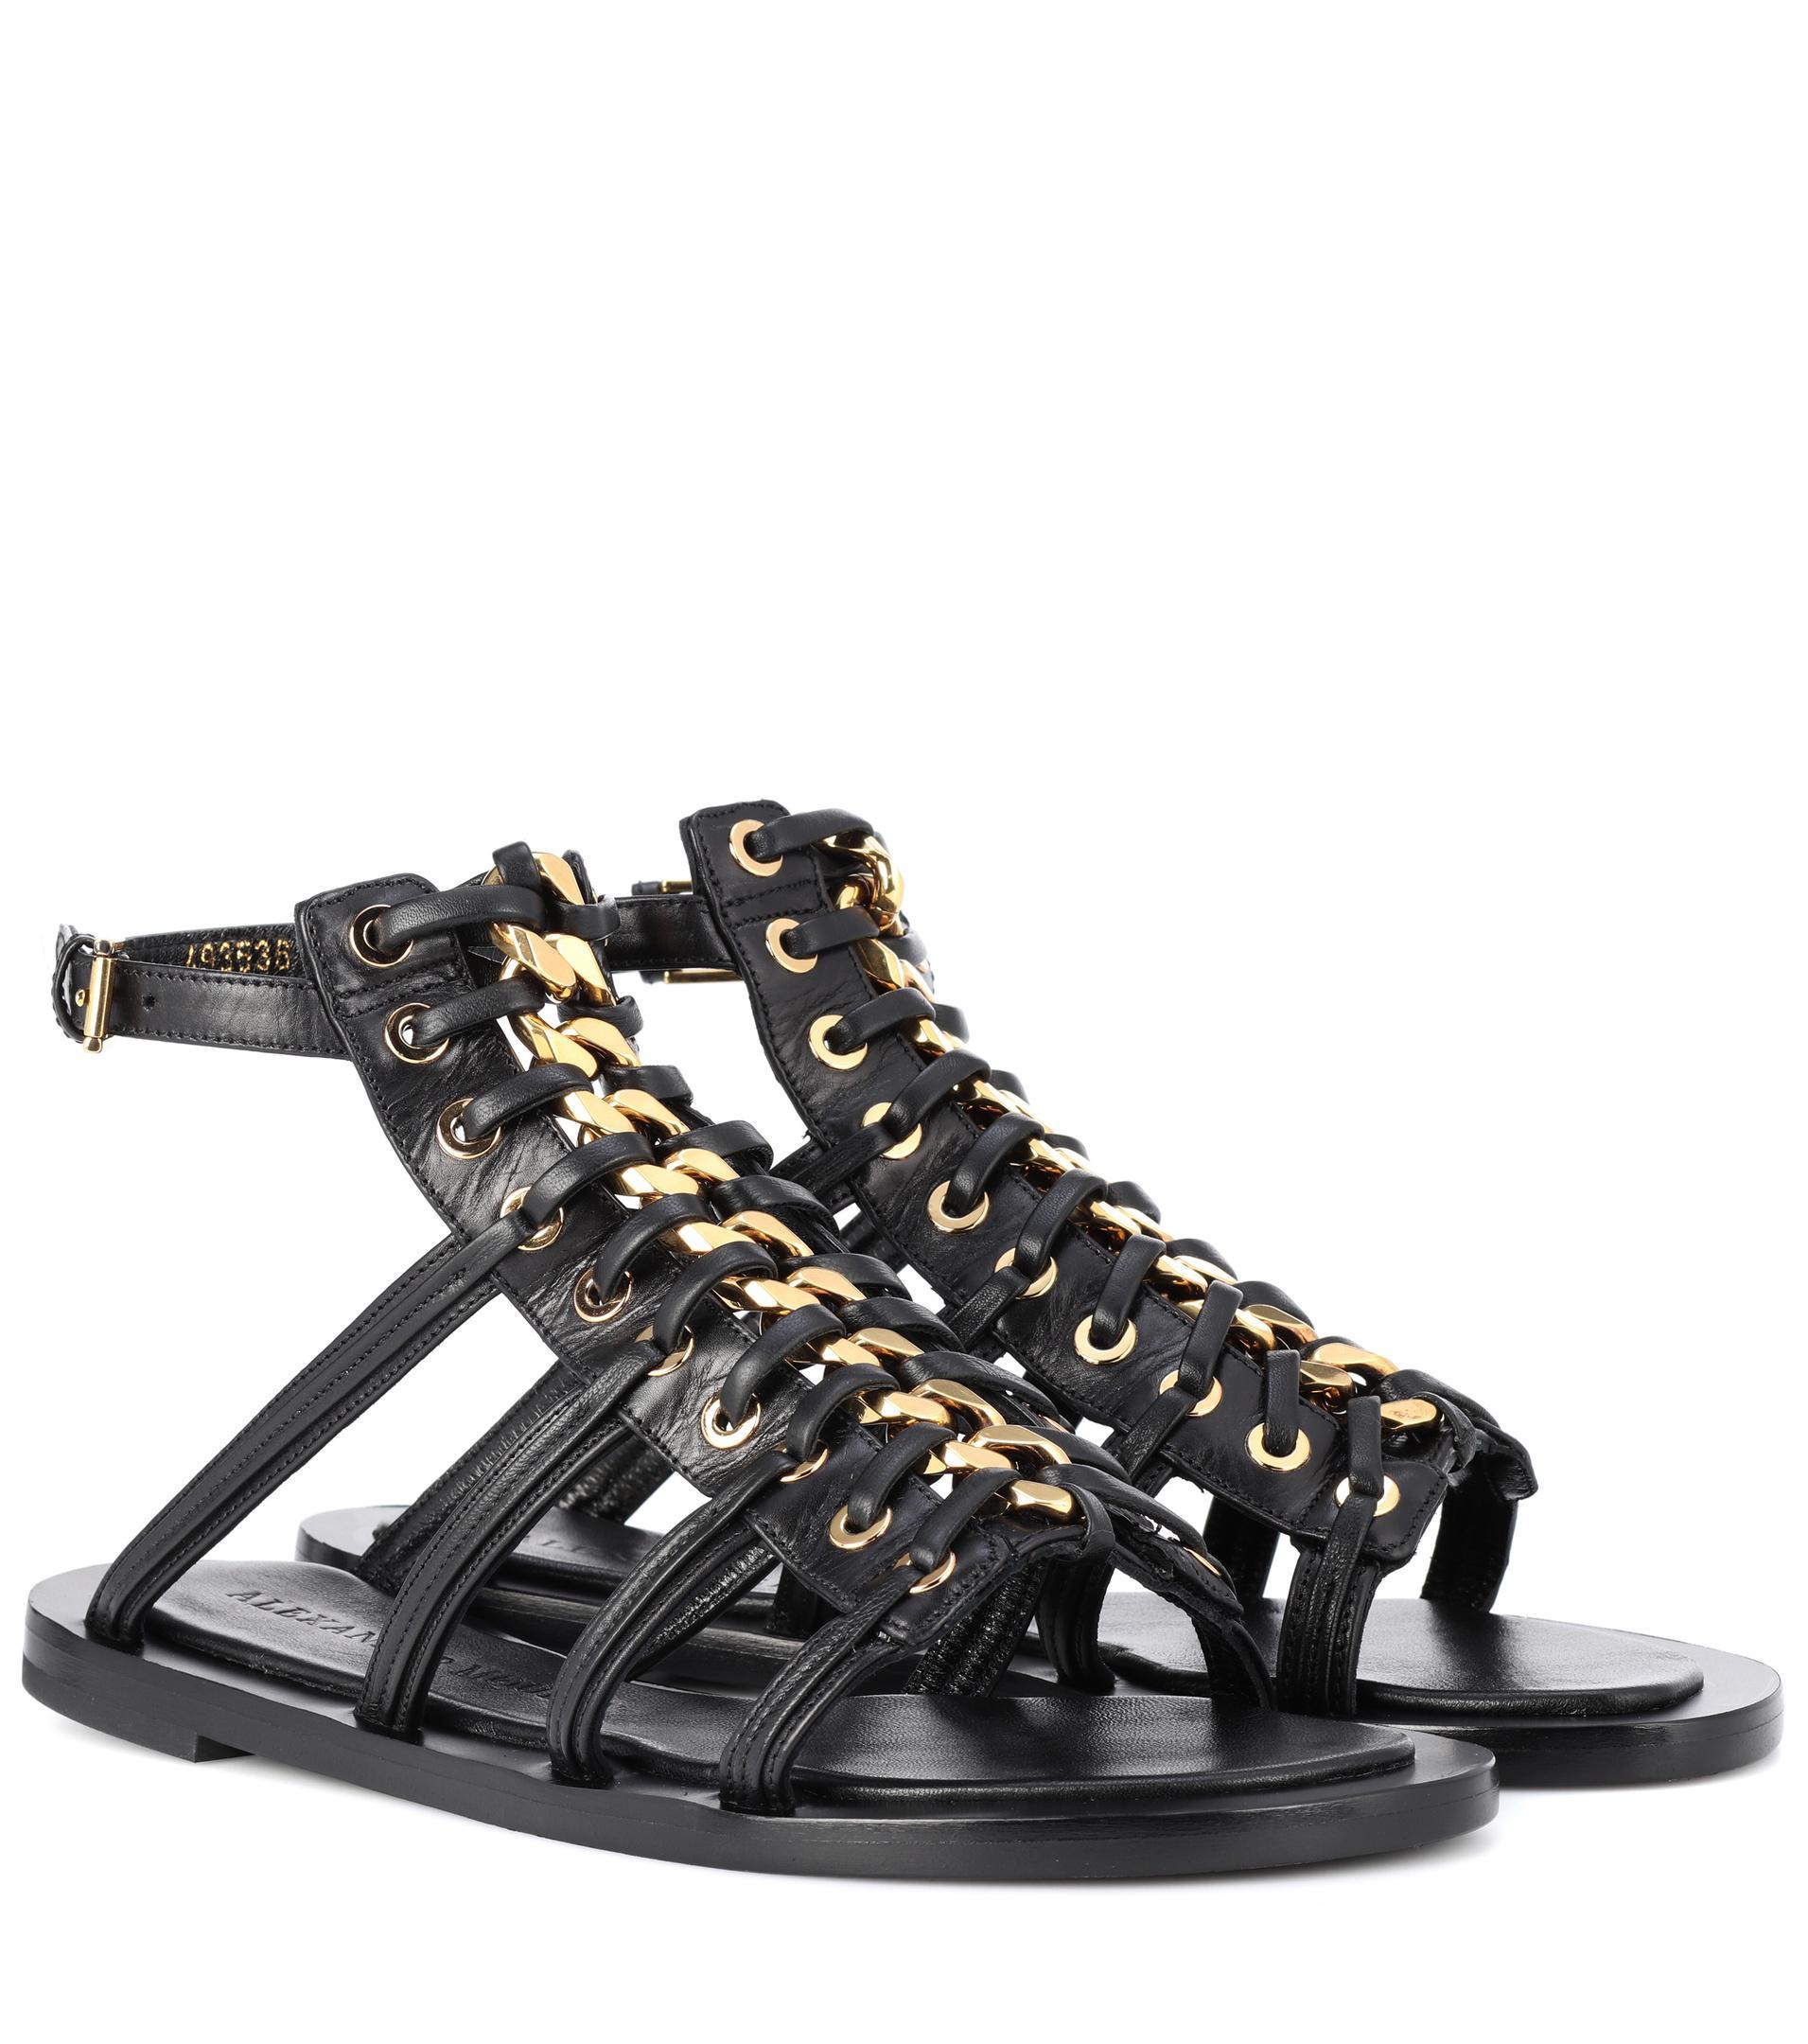 Alexander McQueen Sandals nappa leather Gem RCAvU9